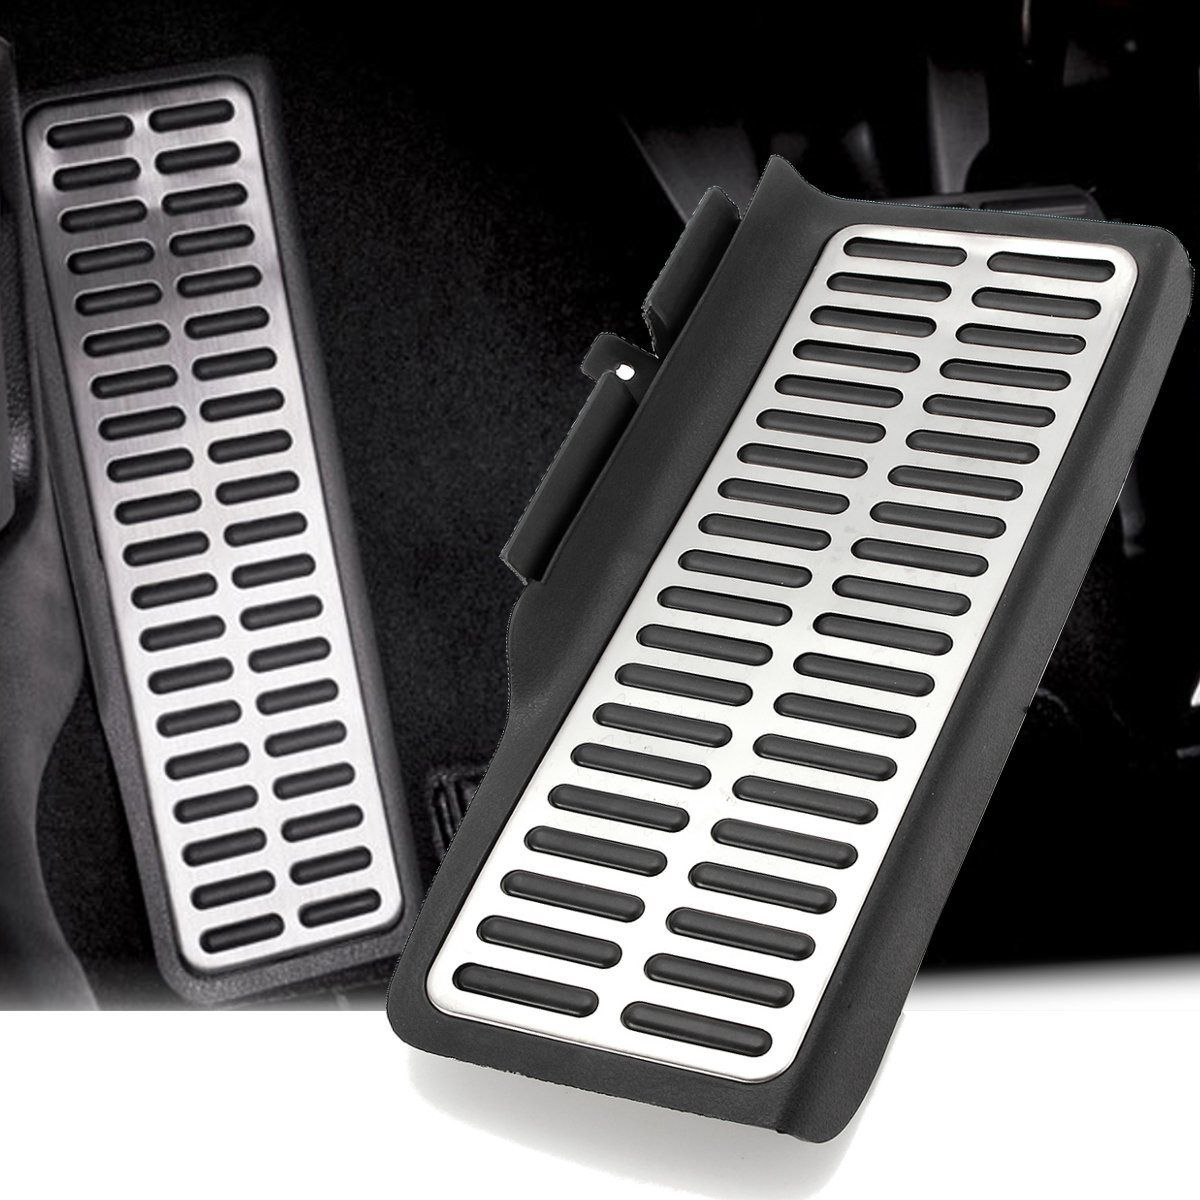 1x Dead Pad Foot Rest Footrest Pedal Aluminum For VW Volkswagen Jetta MK6 2012-2017 Black and Silver Super Anti-skid